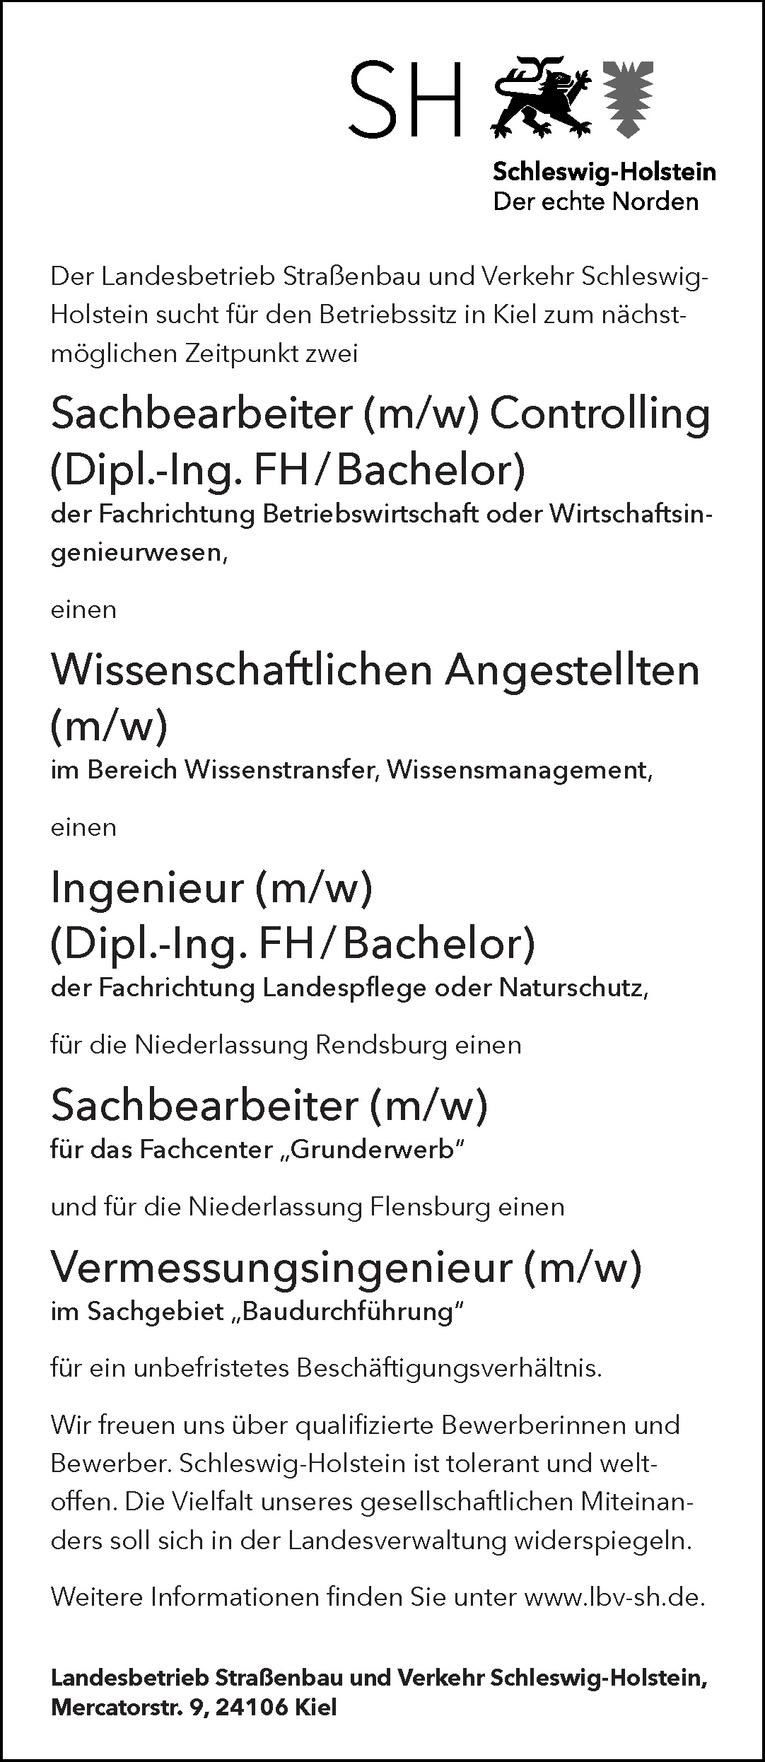 Vermessungsingenieur (m/w)